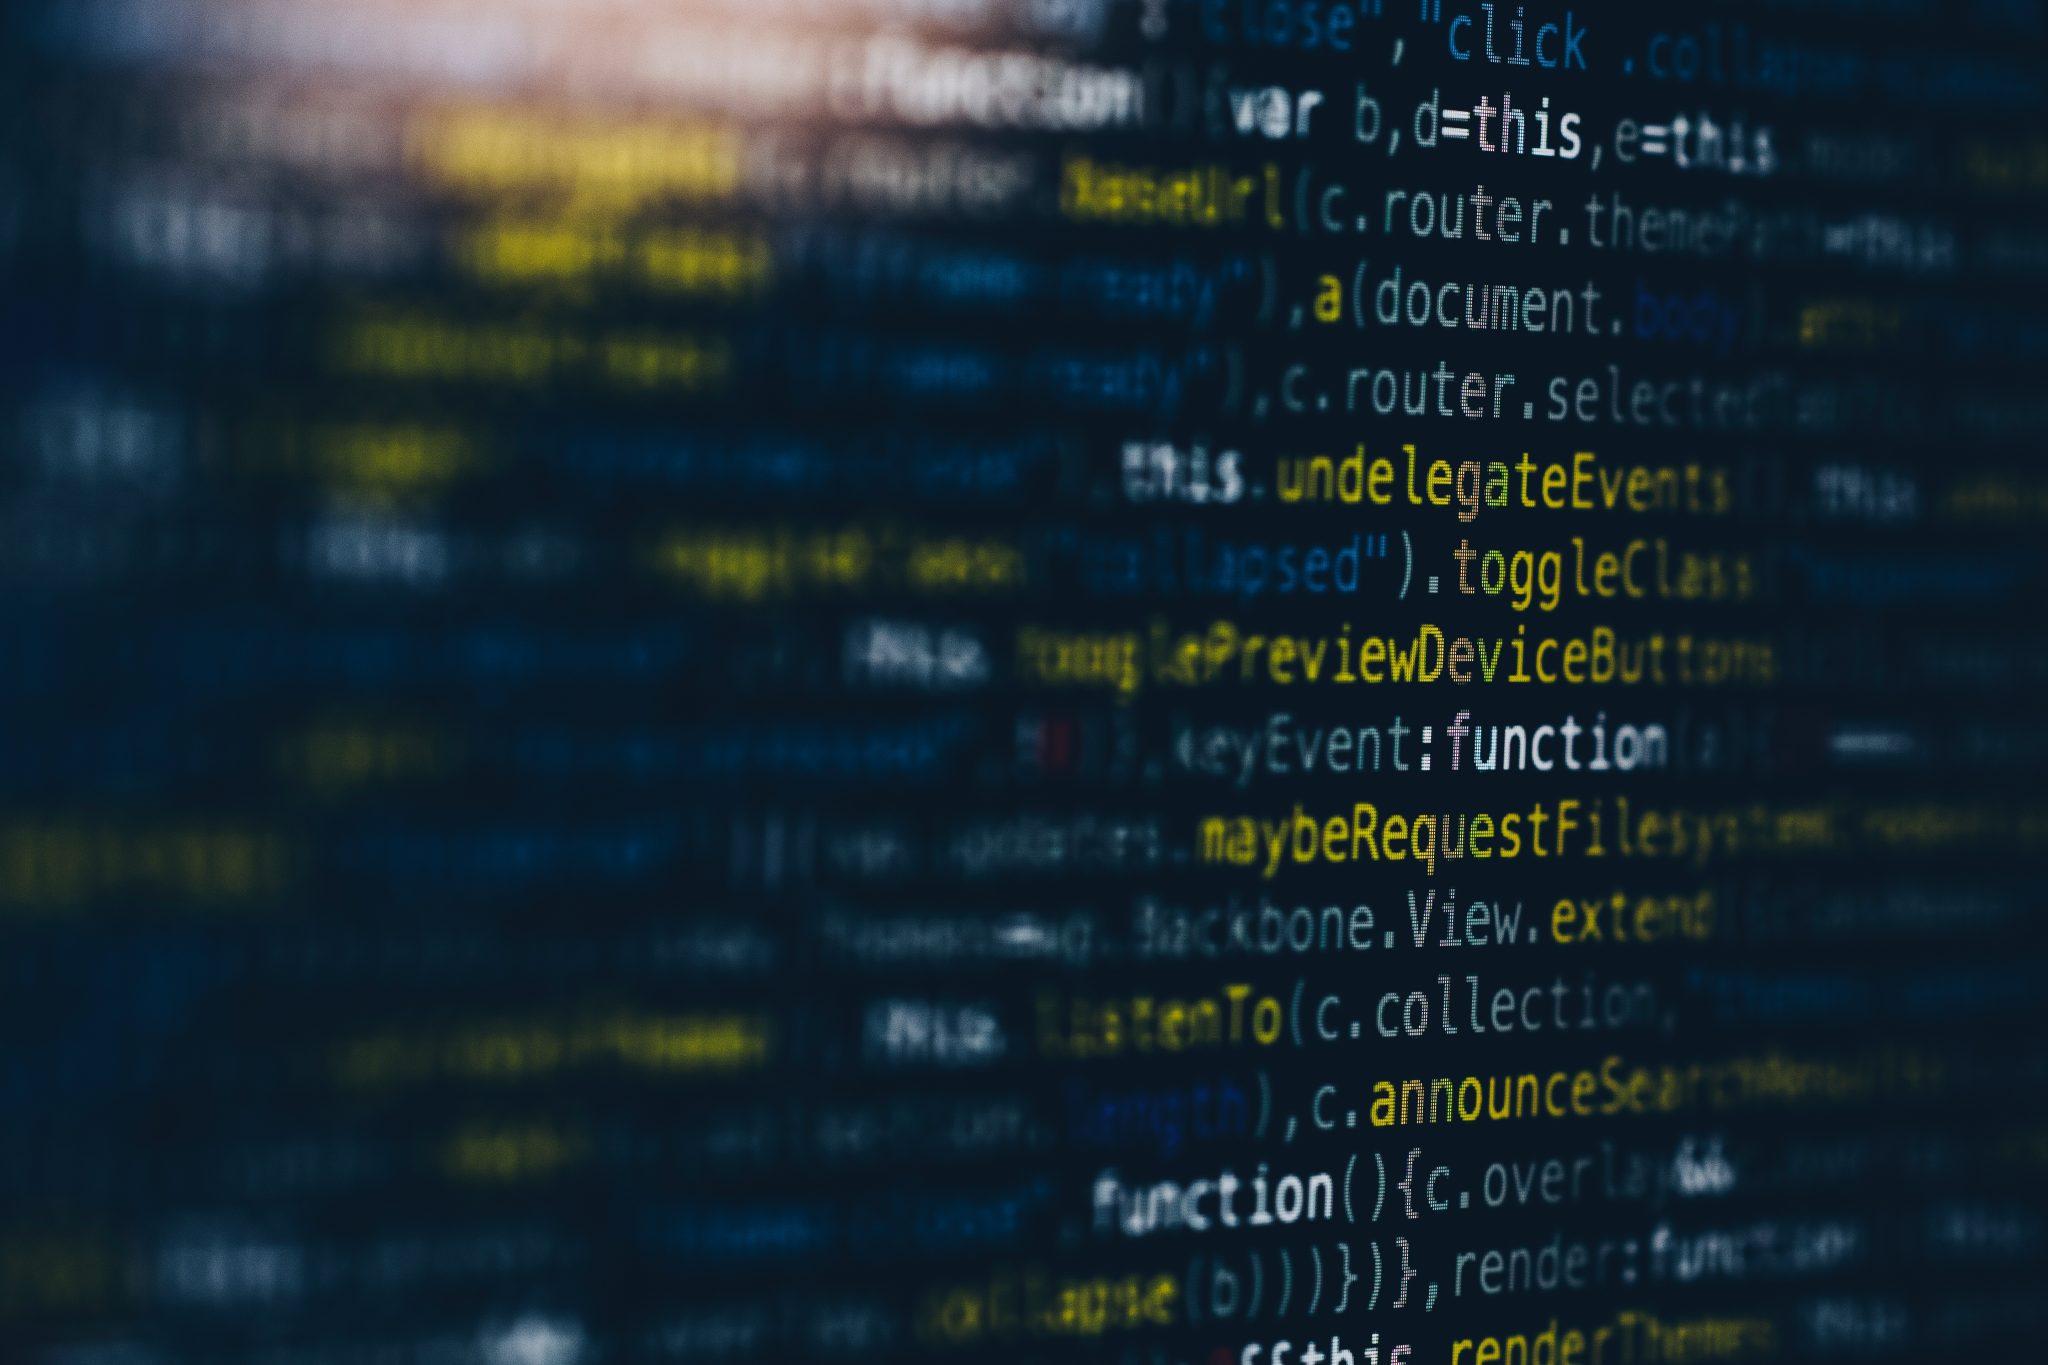 Samsung development lab leaked highly sensitive source code